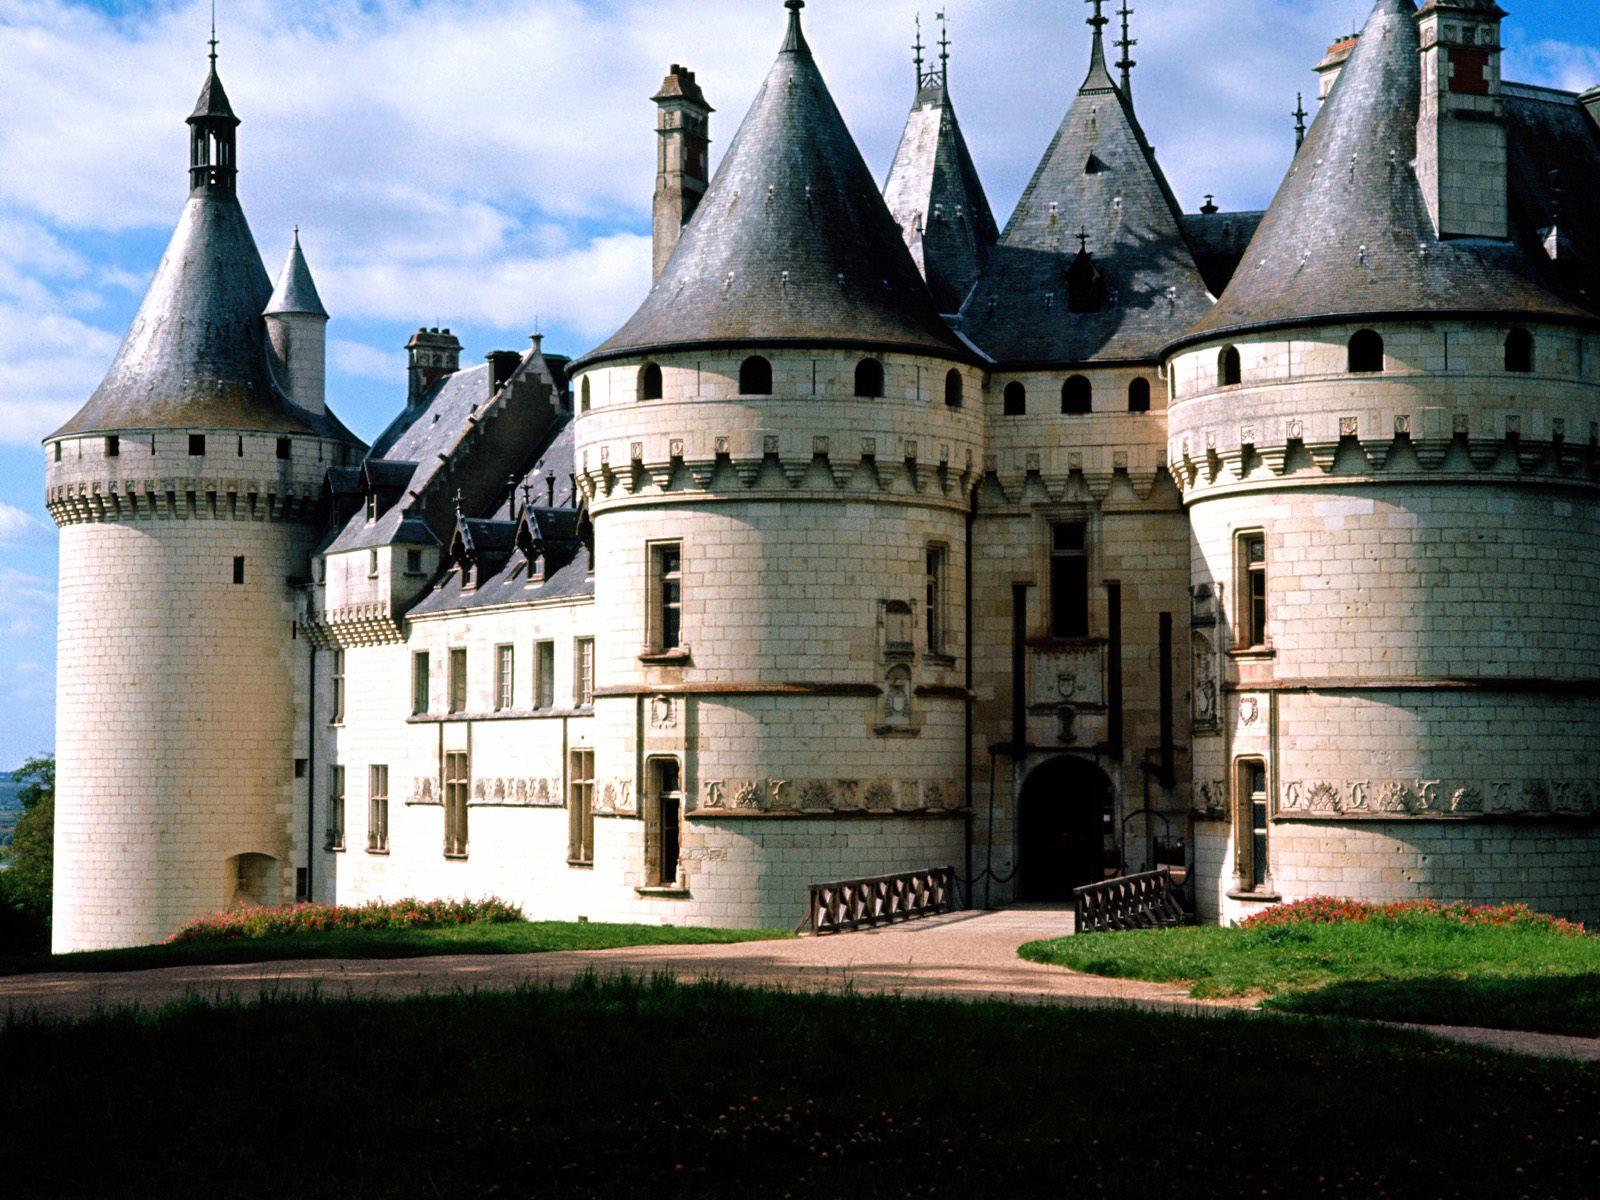 castle wallpaper nice france - photo #23